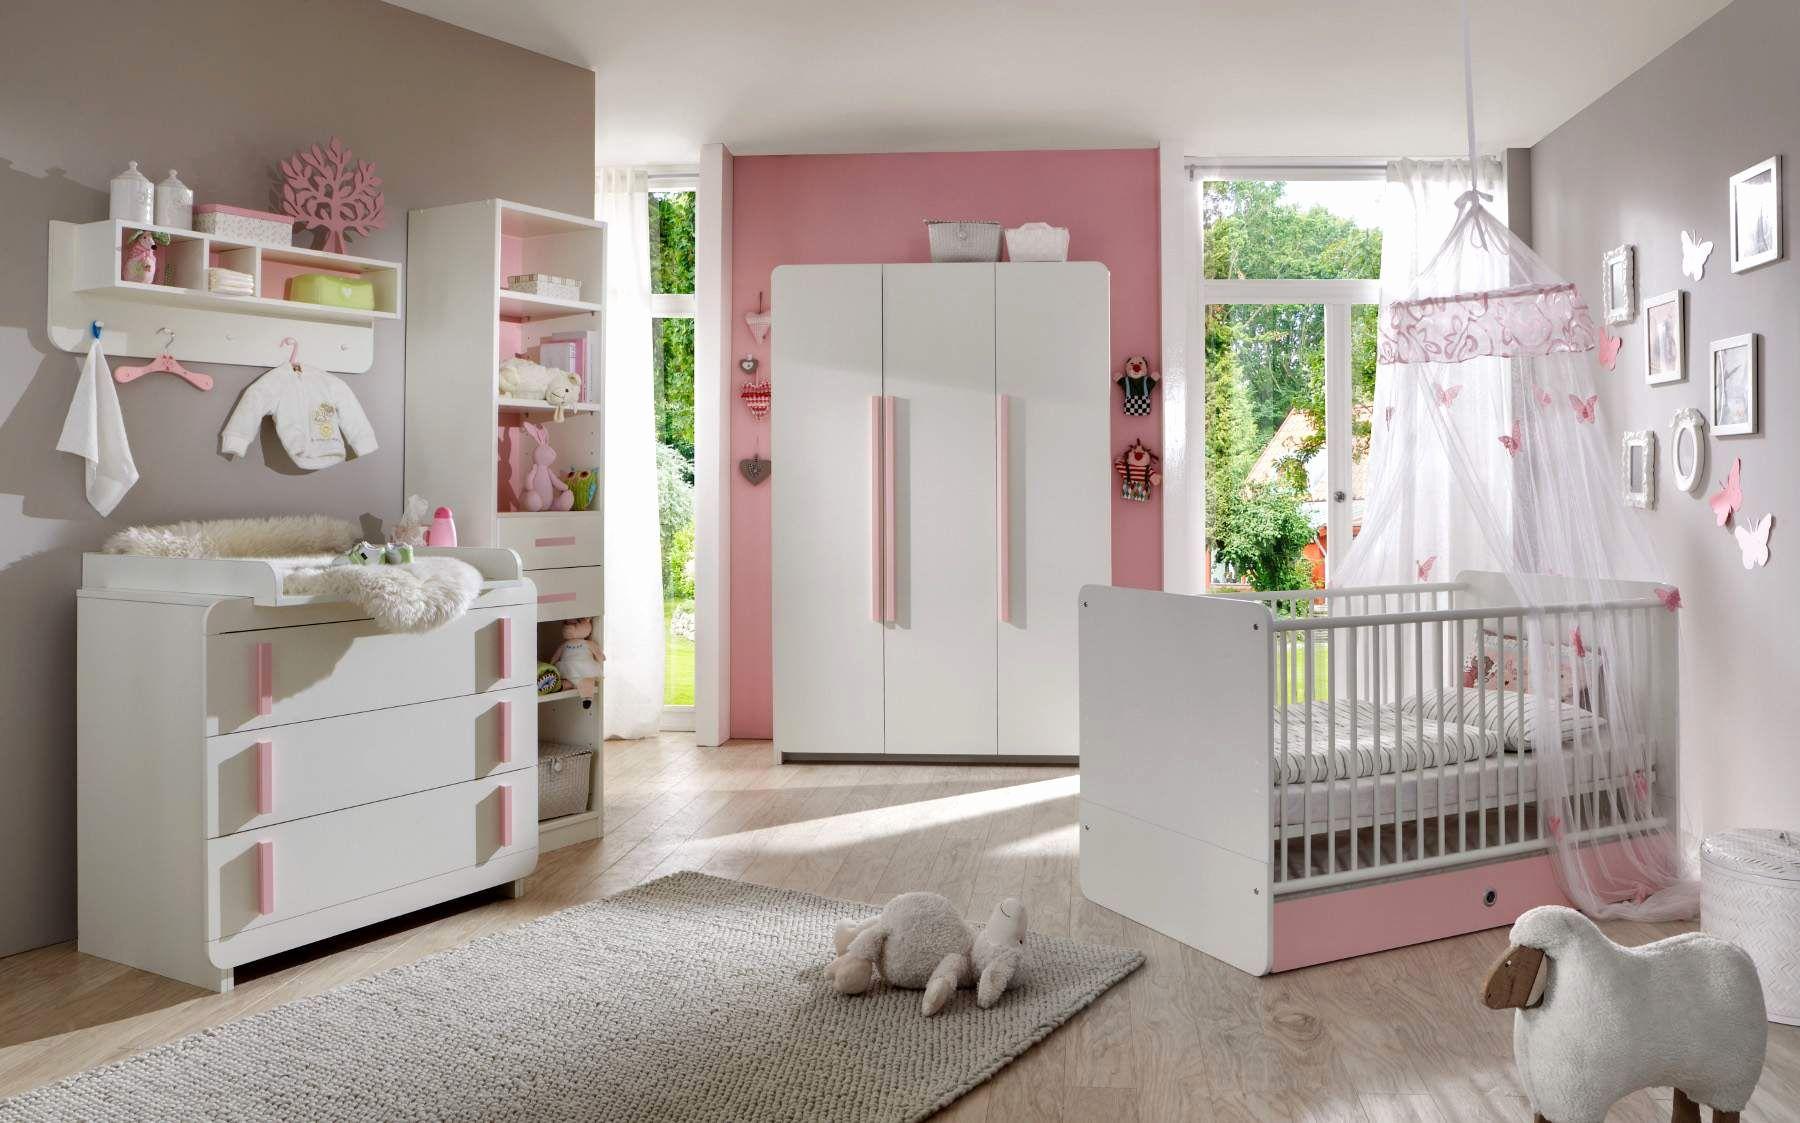 27 Elegant Fototapete Kinderzimmer Mädchen https//www